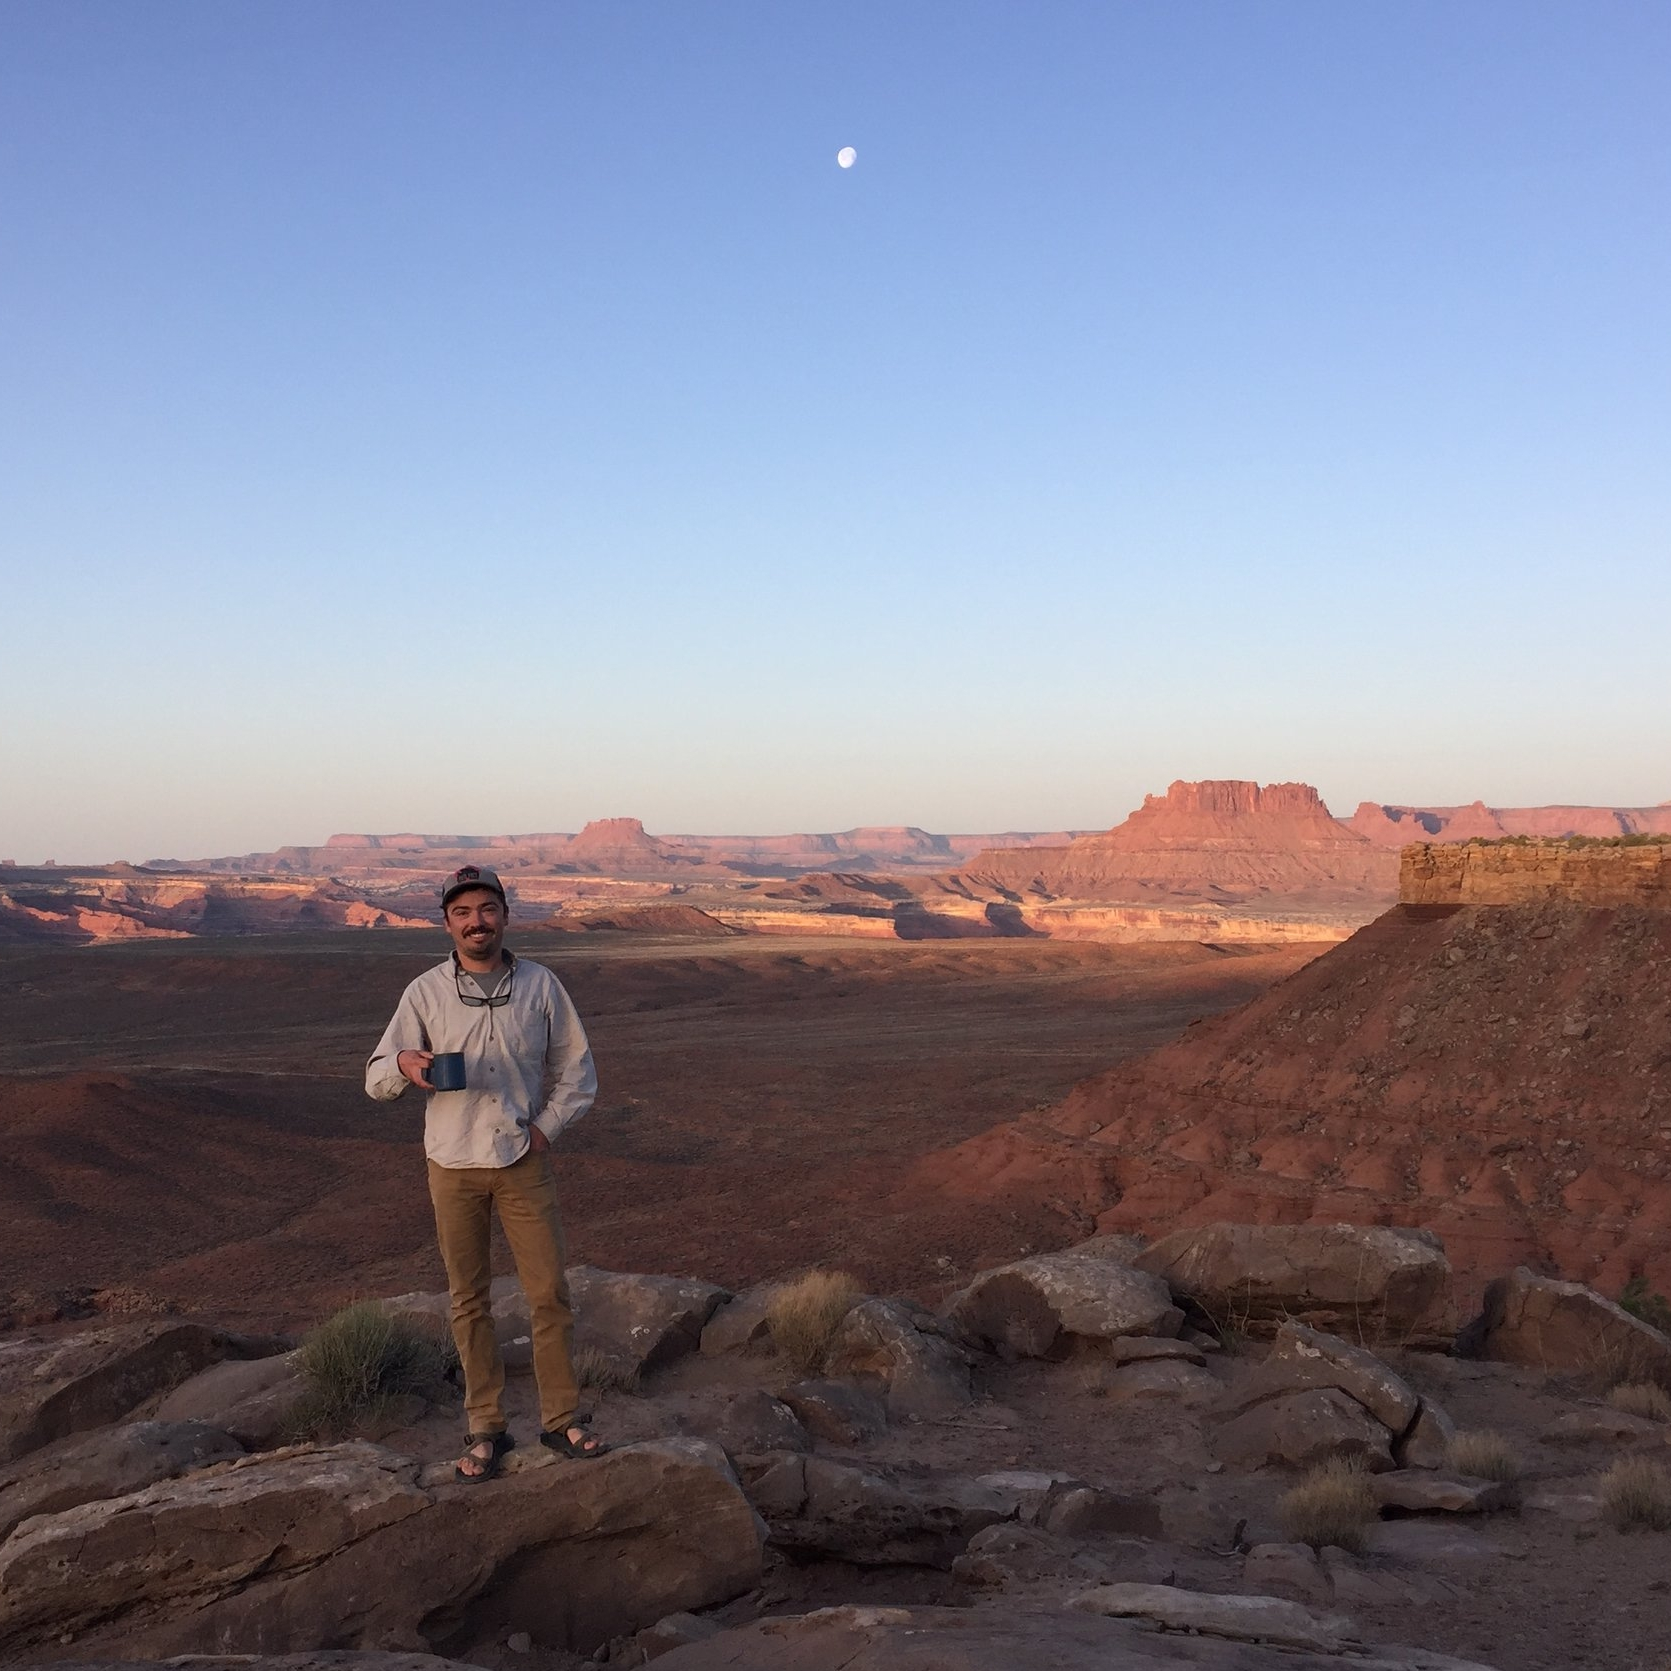 Morning coffee near Moab, UT